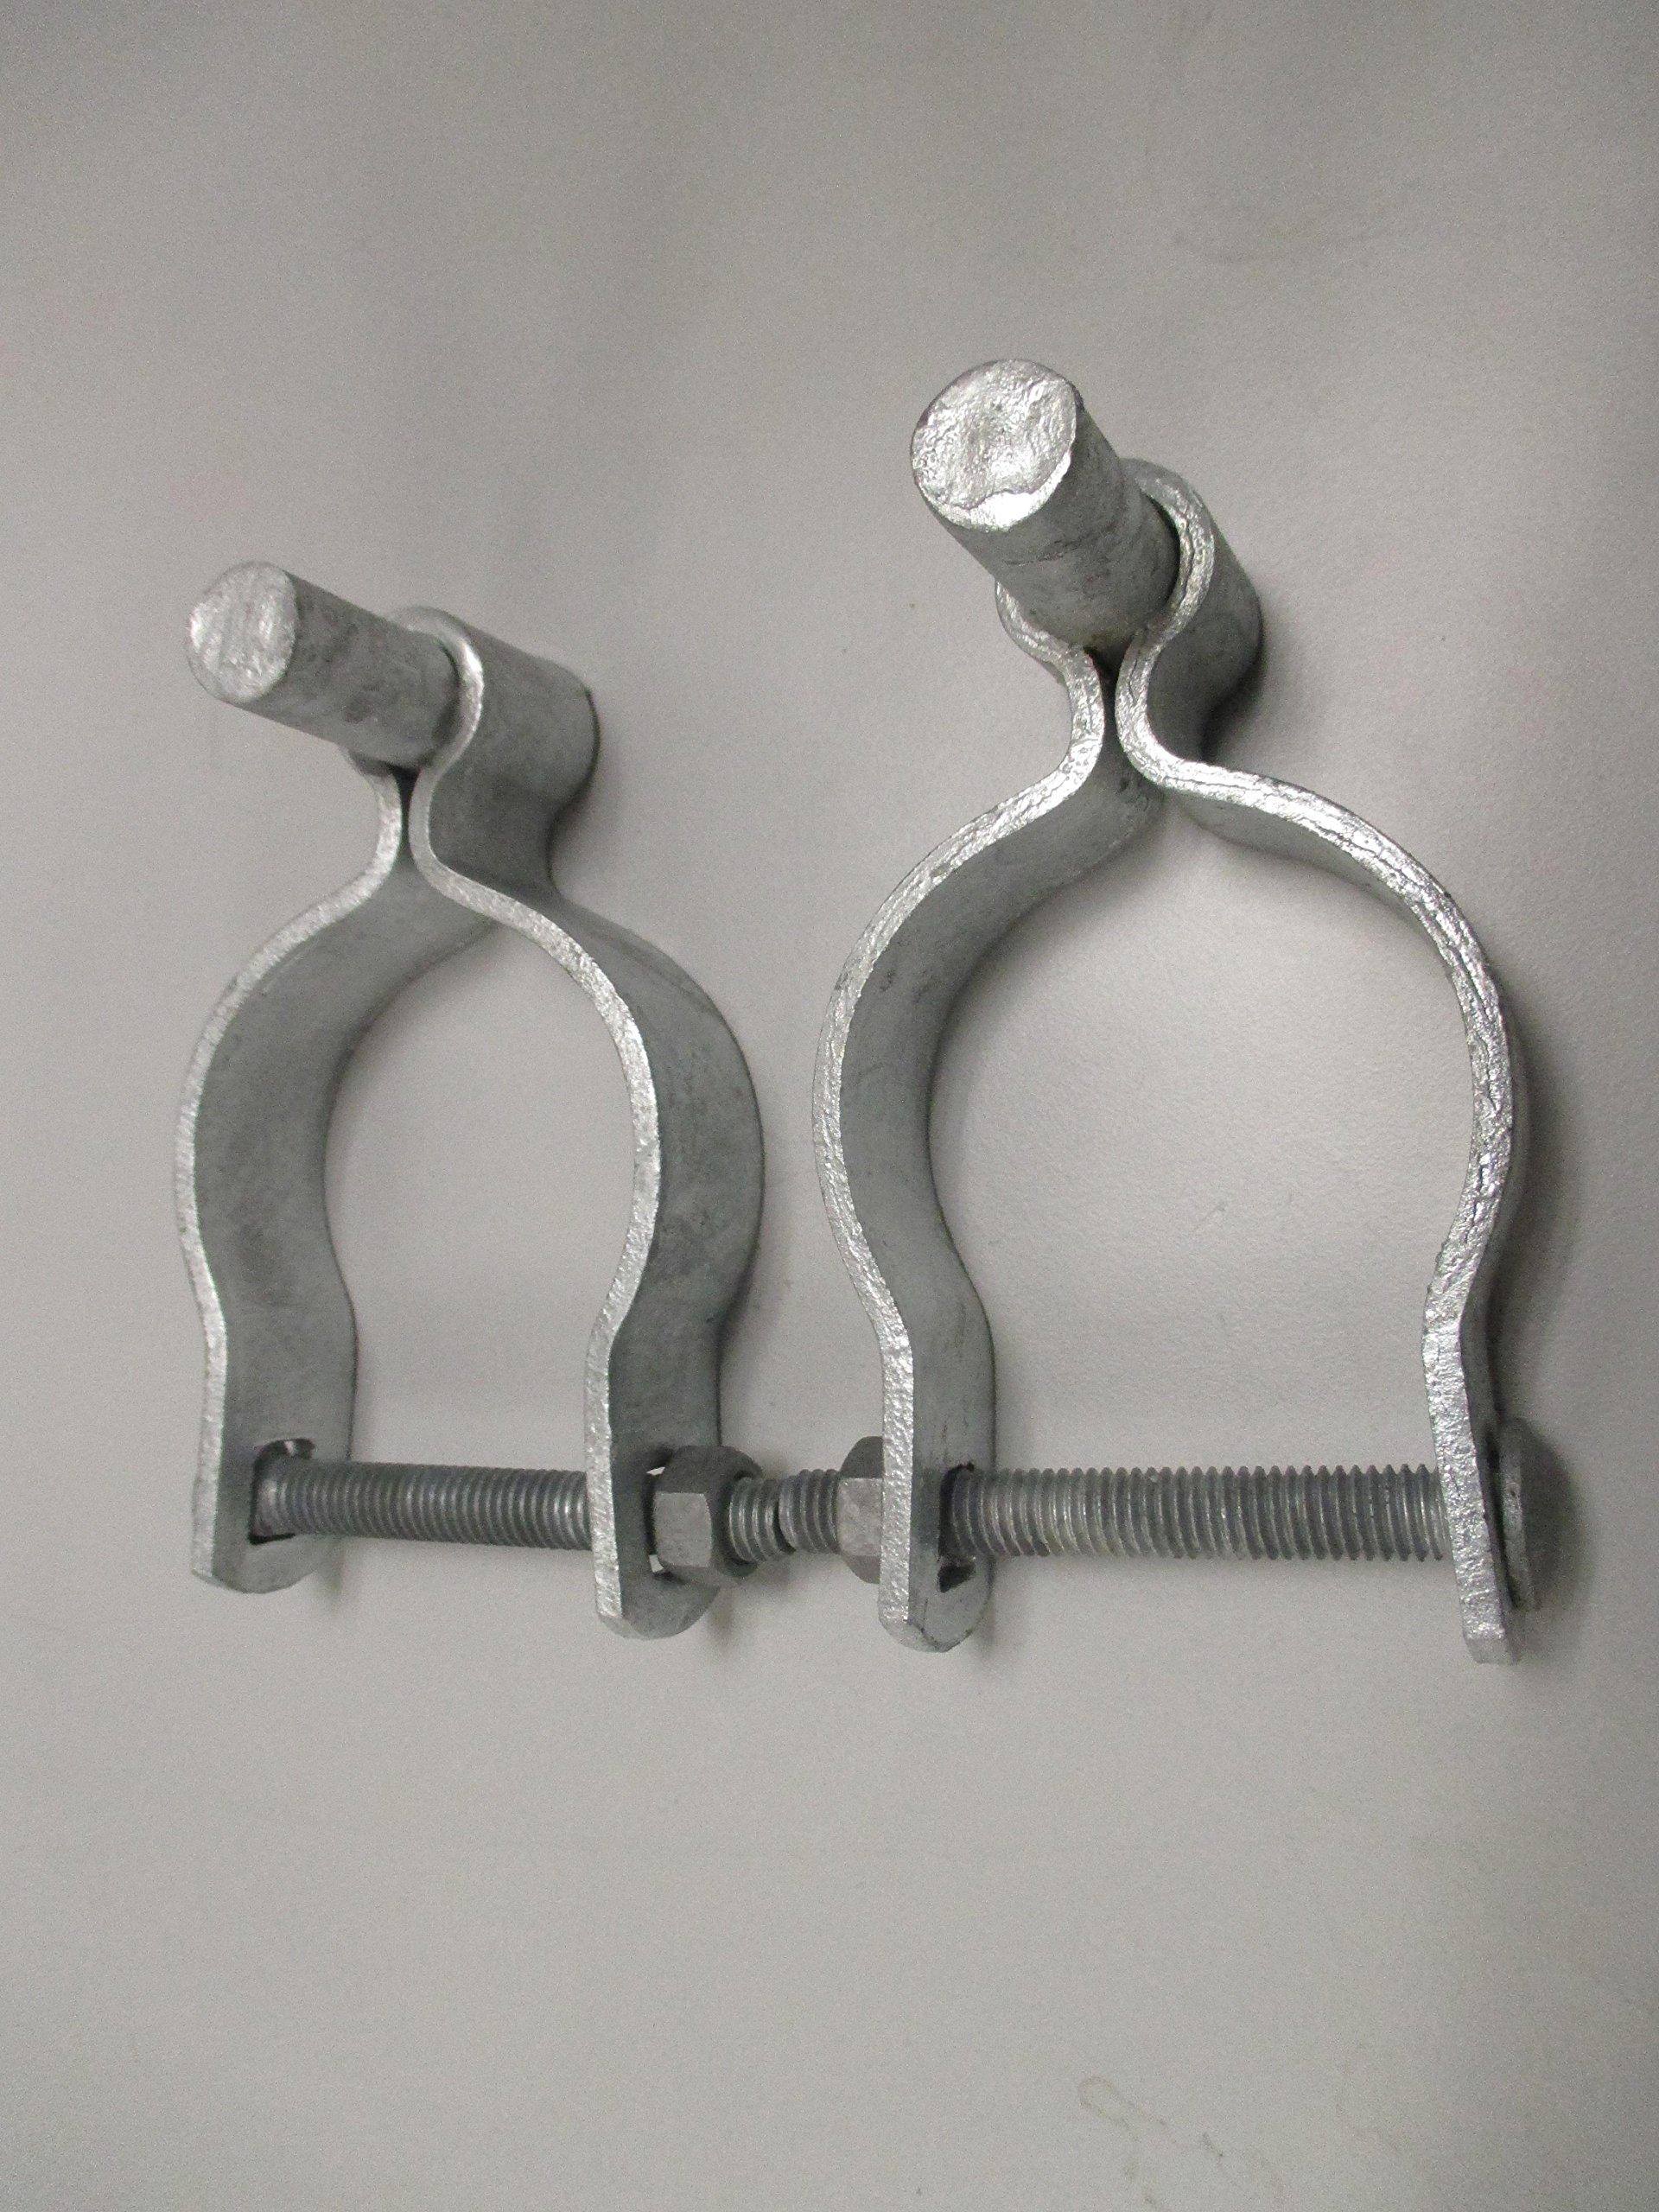 Pressed Steel Chain Link Fence Post Hinge w/Bolt - (2 Sets Pack) (1-3/8'')